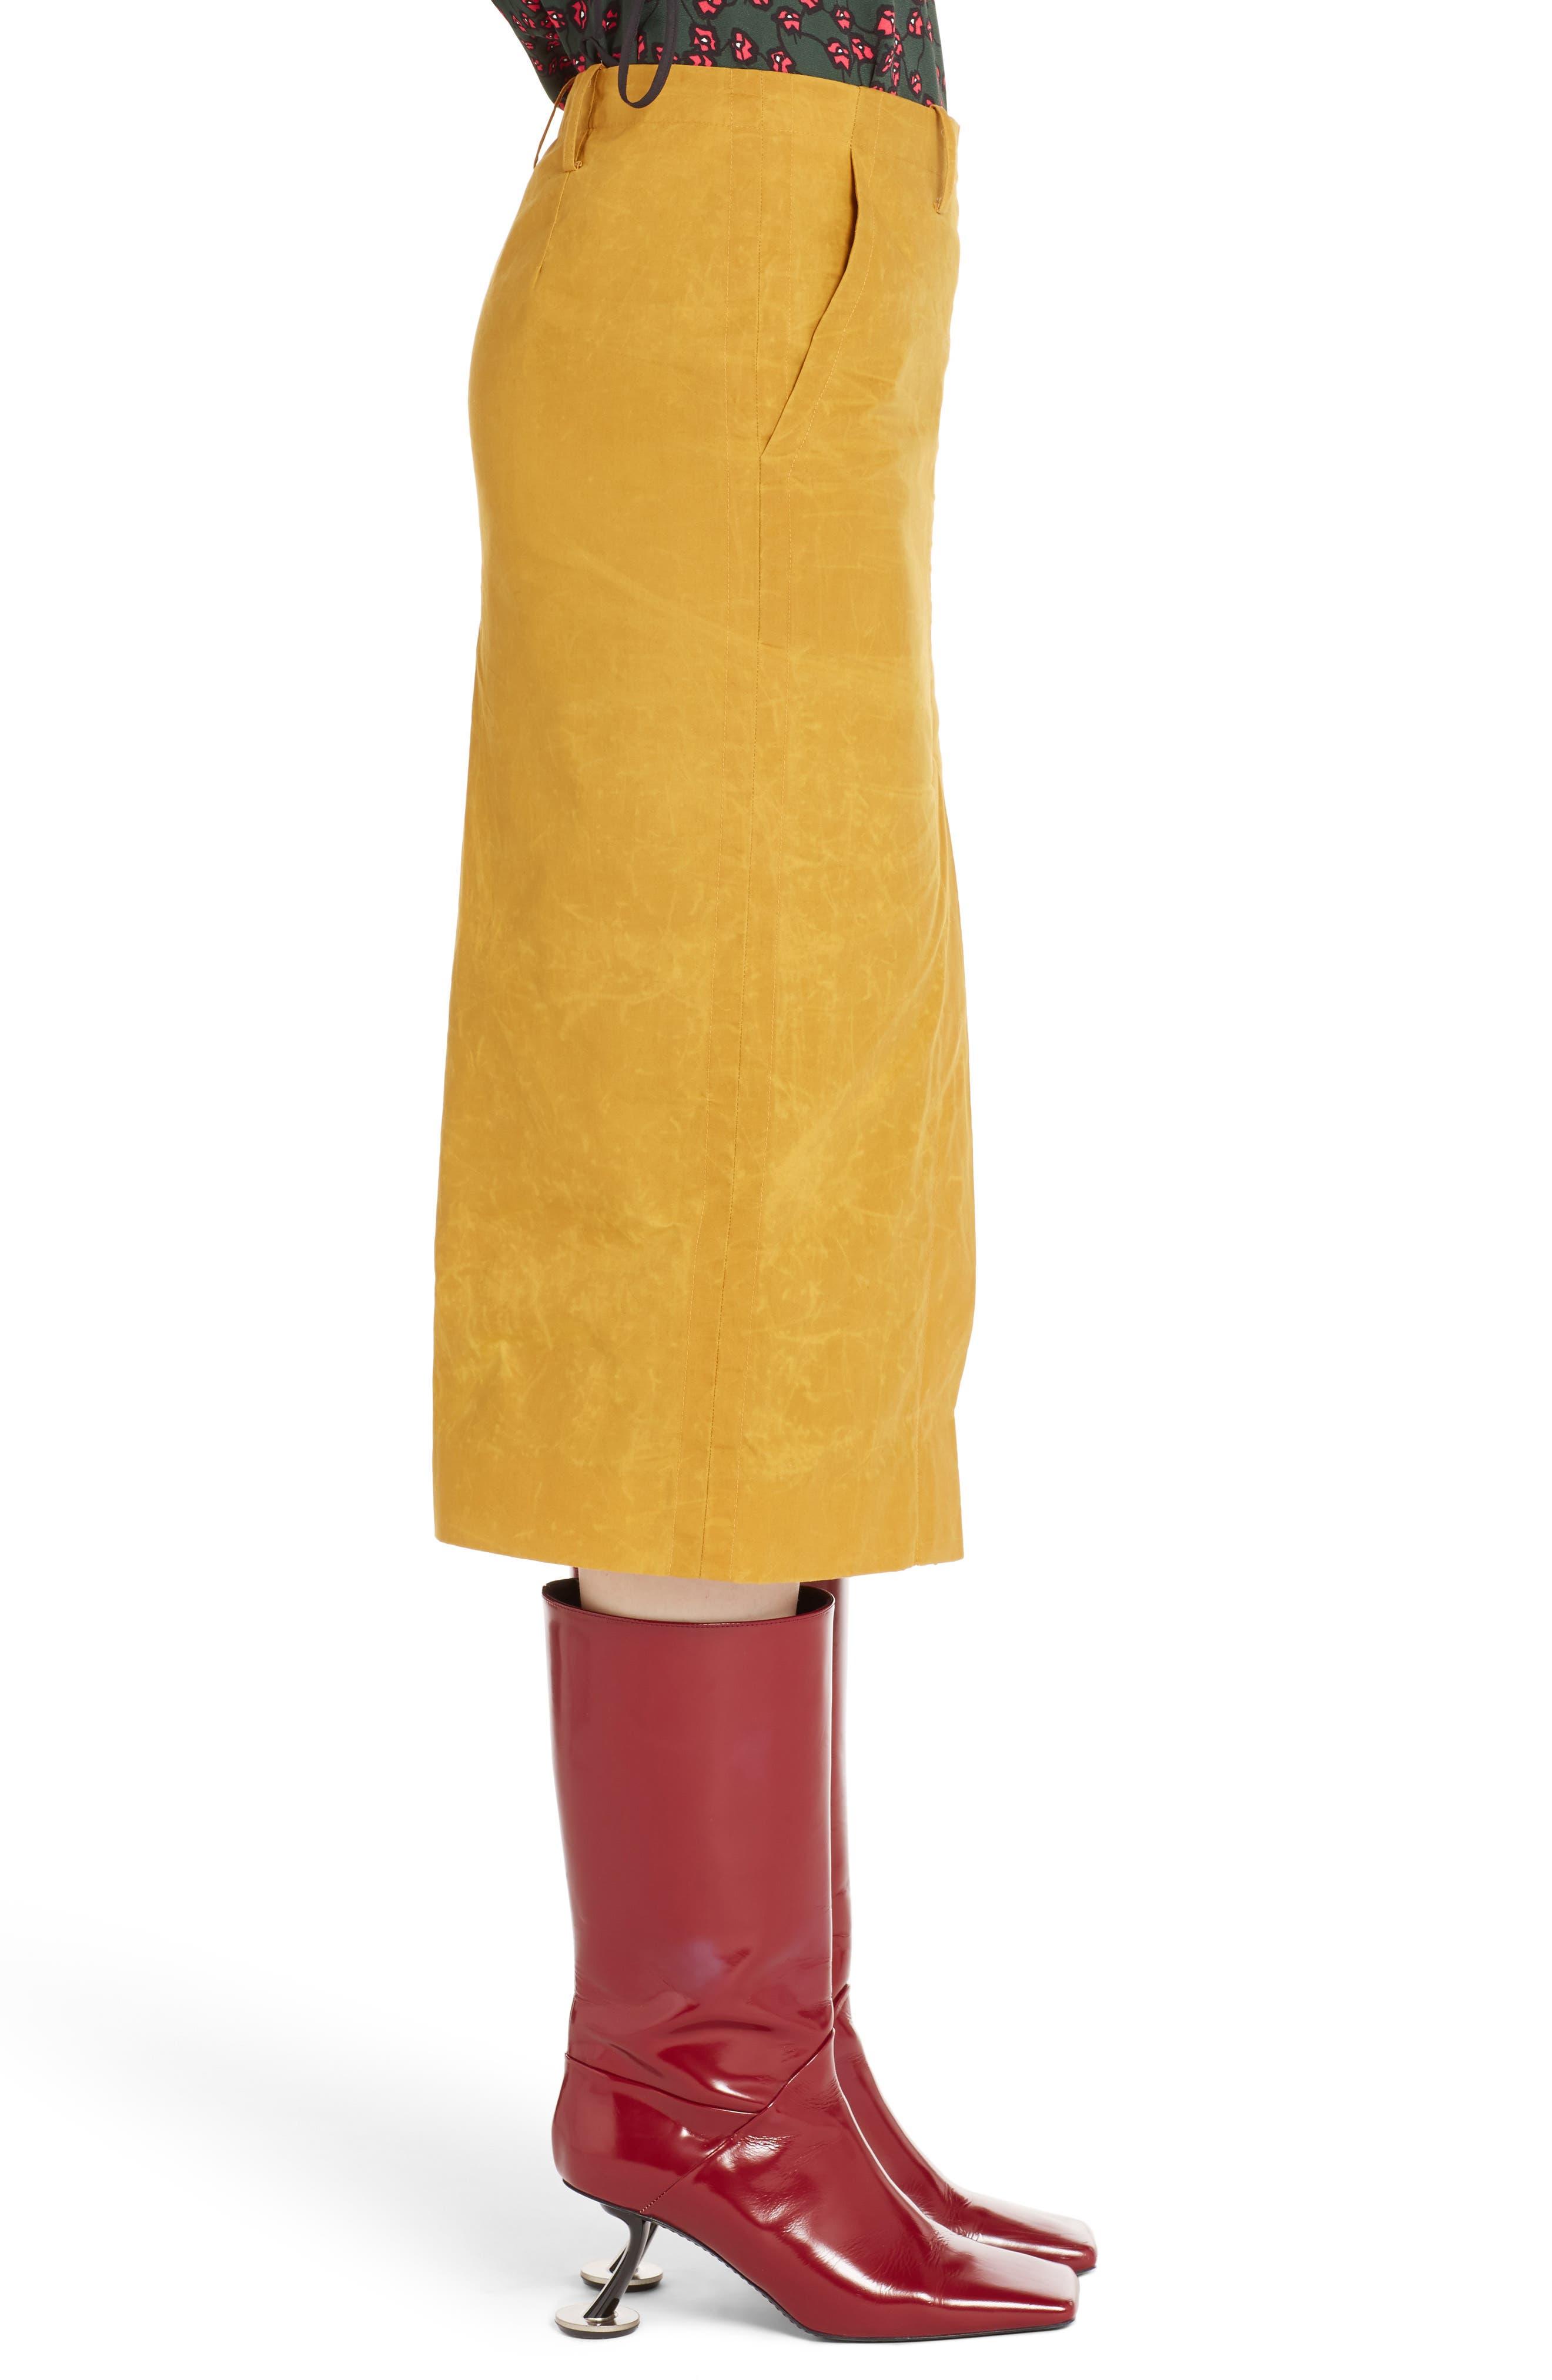 Alternate Image 3  - Marni Waxed Cotton Pencil Skirt